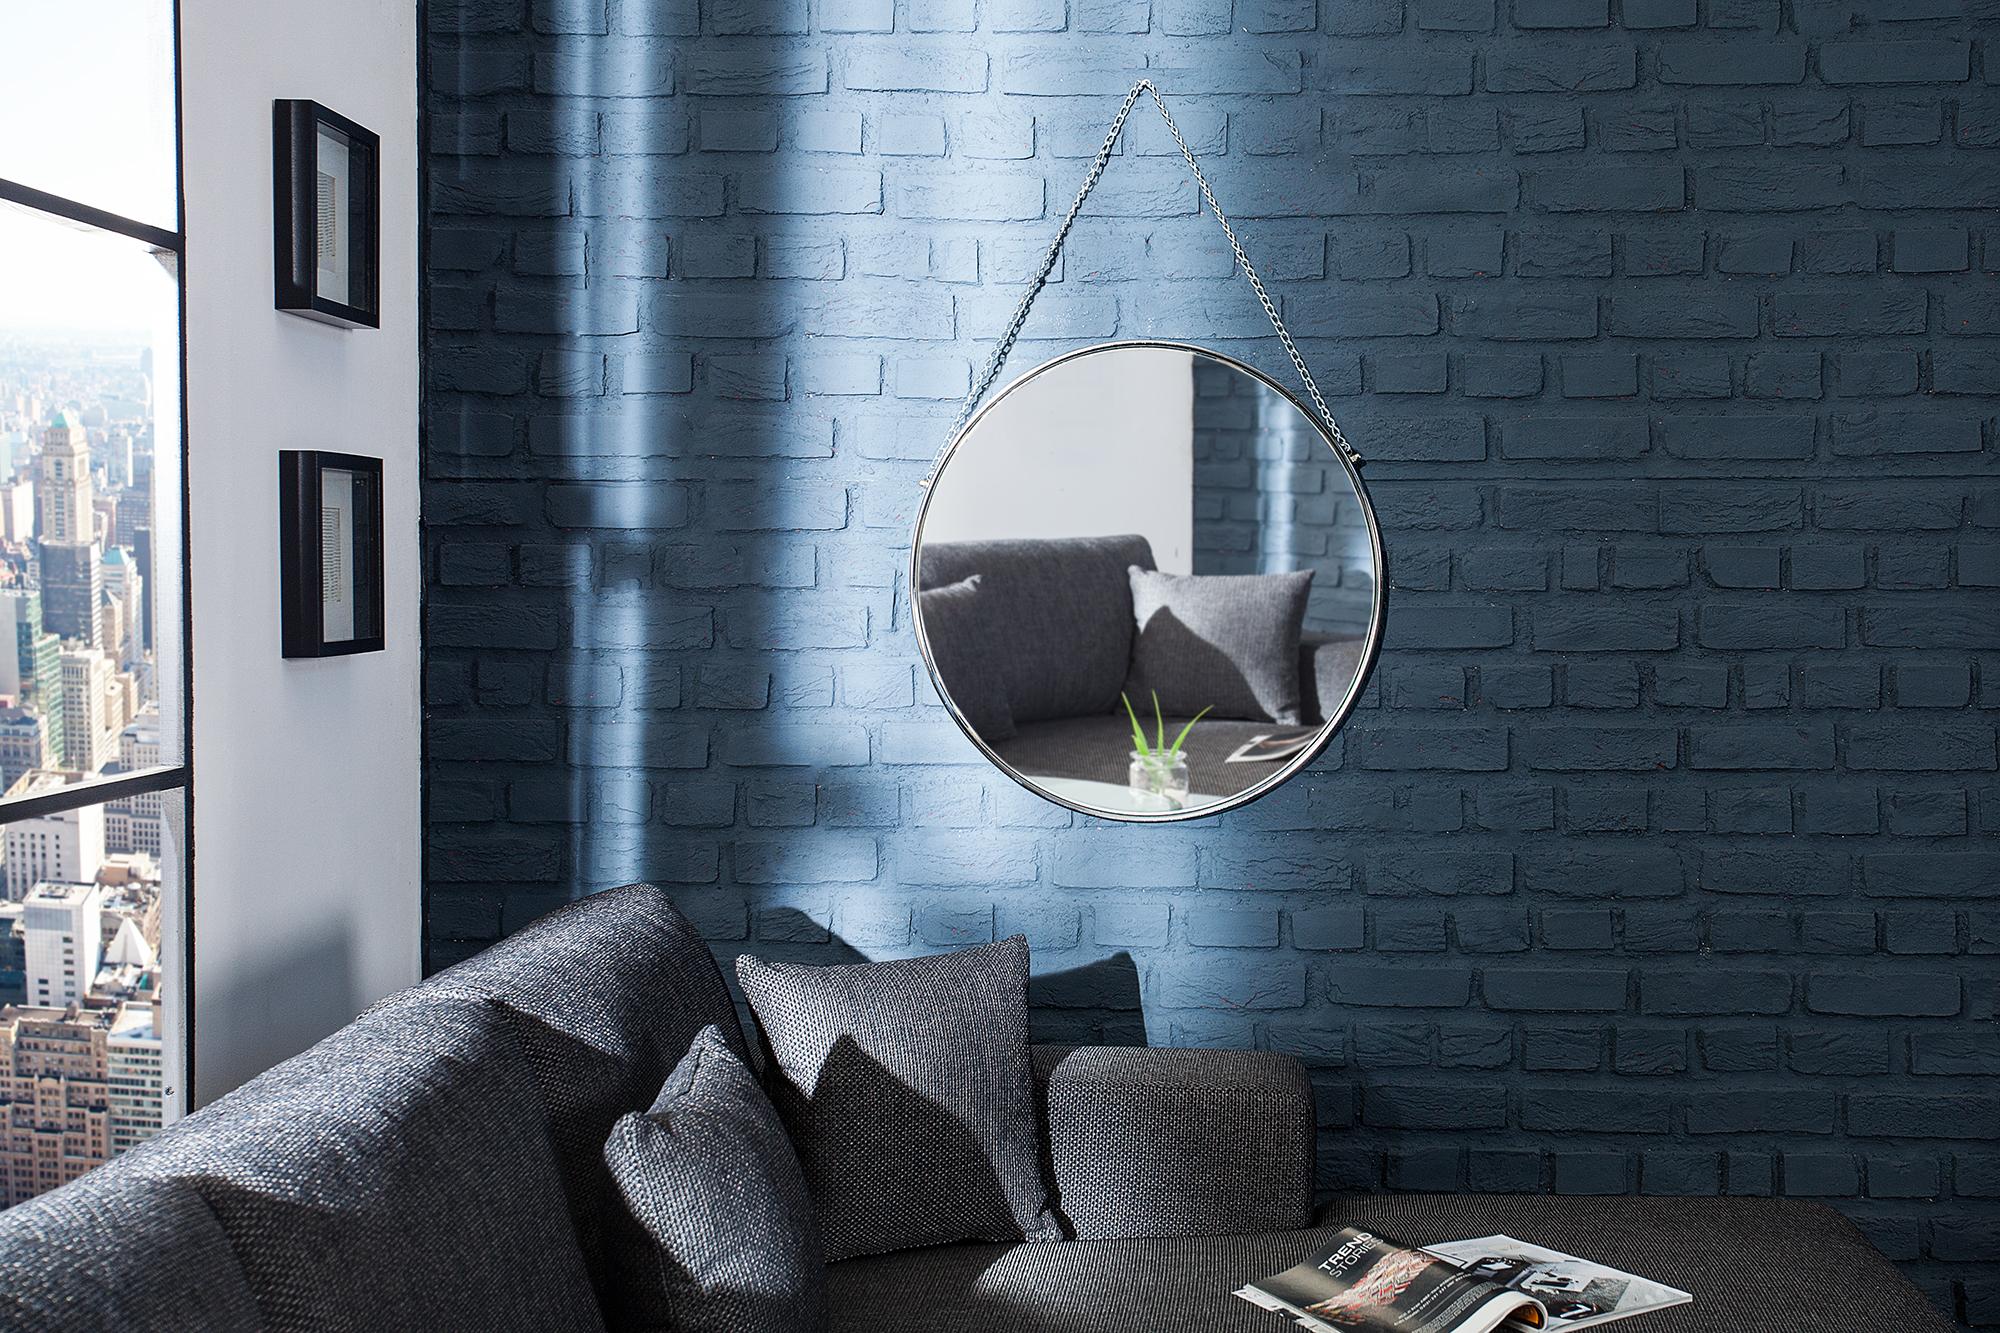 Wandspiegel Badspiegel Rundspiegel THEODOR Bad Flur Metall 45 cm Farbauswahl